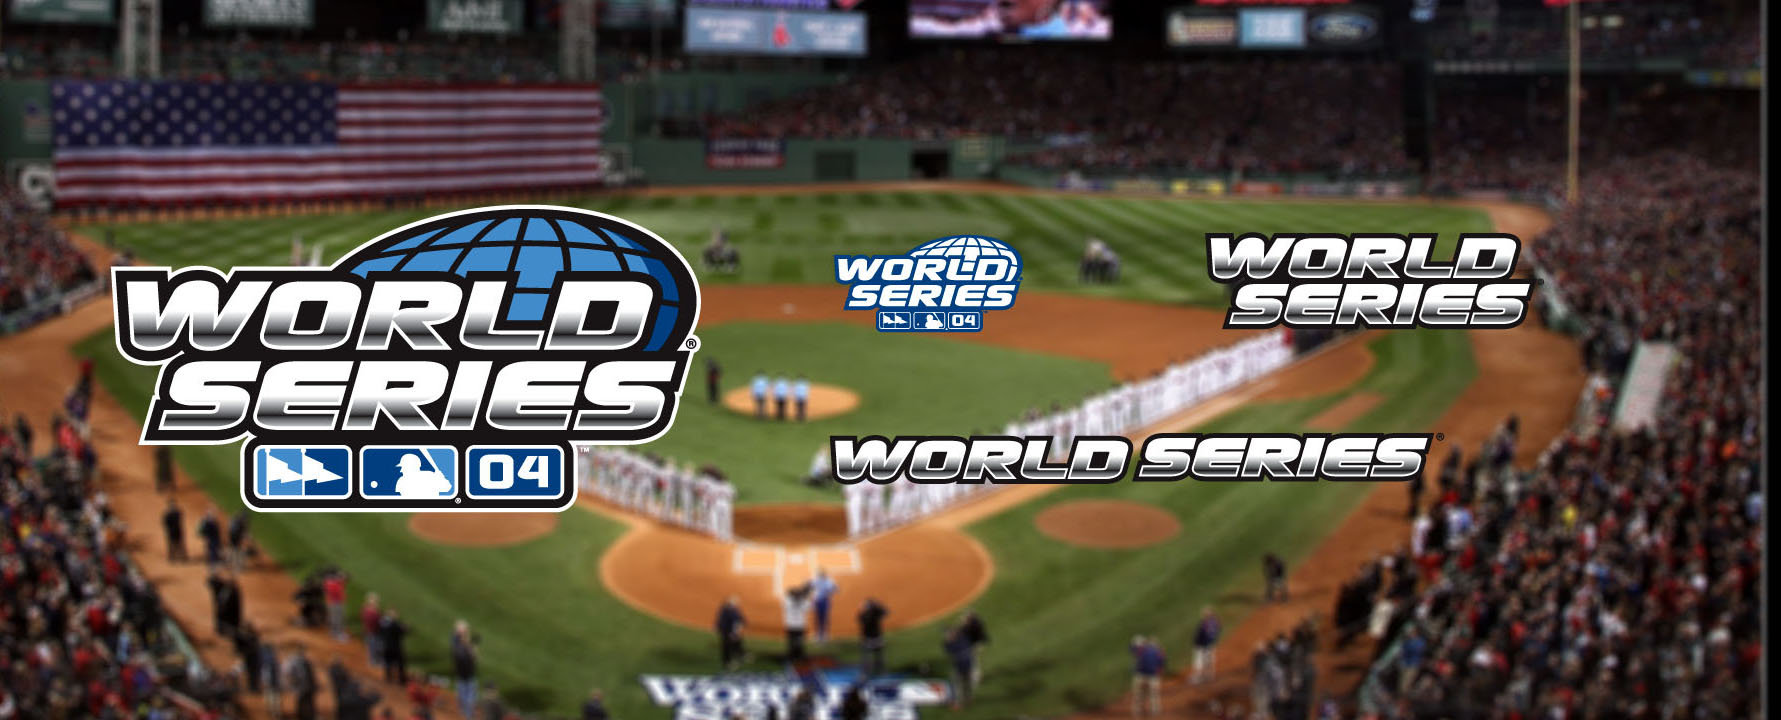 World_Series_Slider_2004-Recap-4.jpg